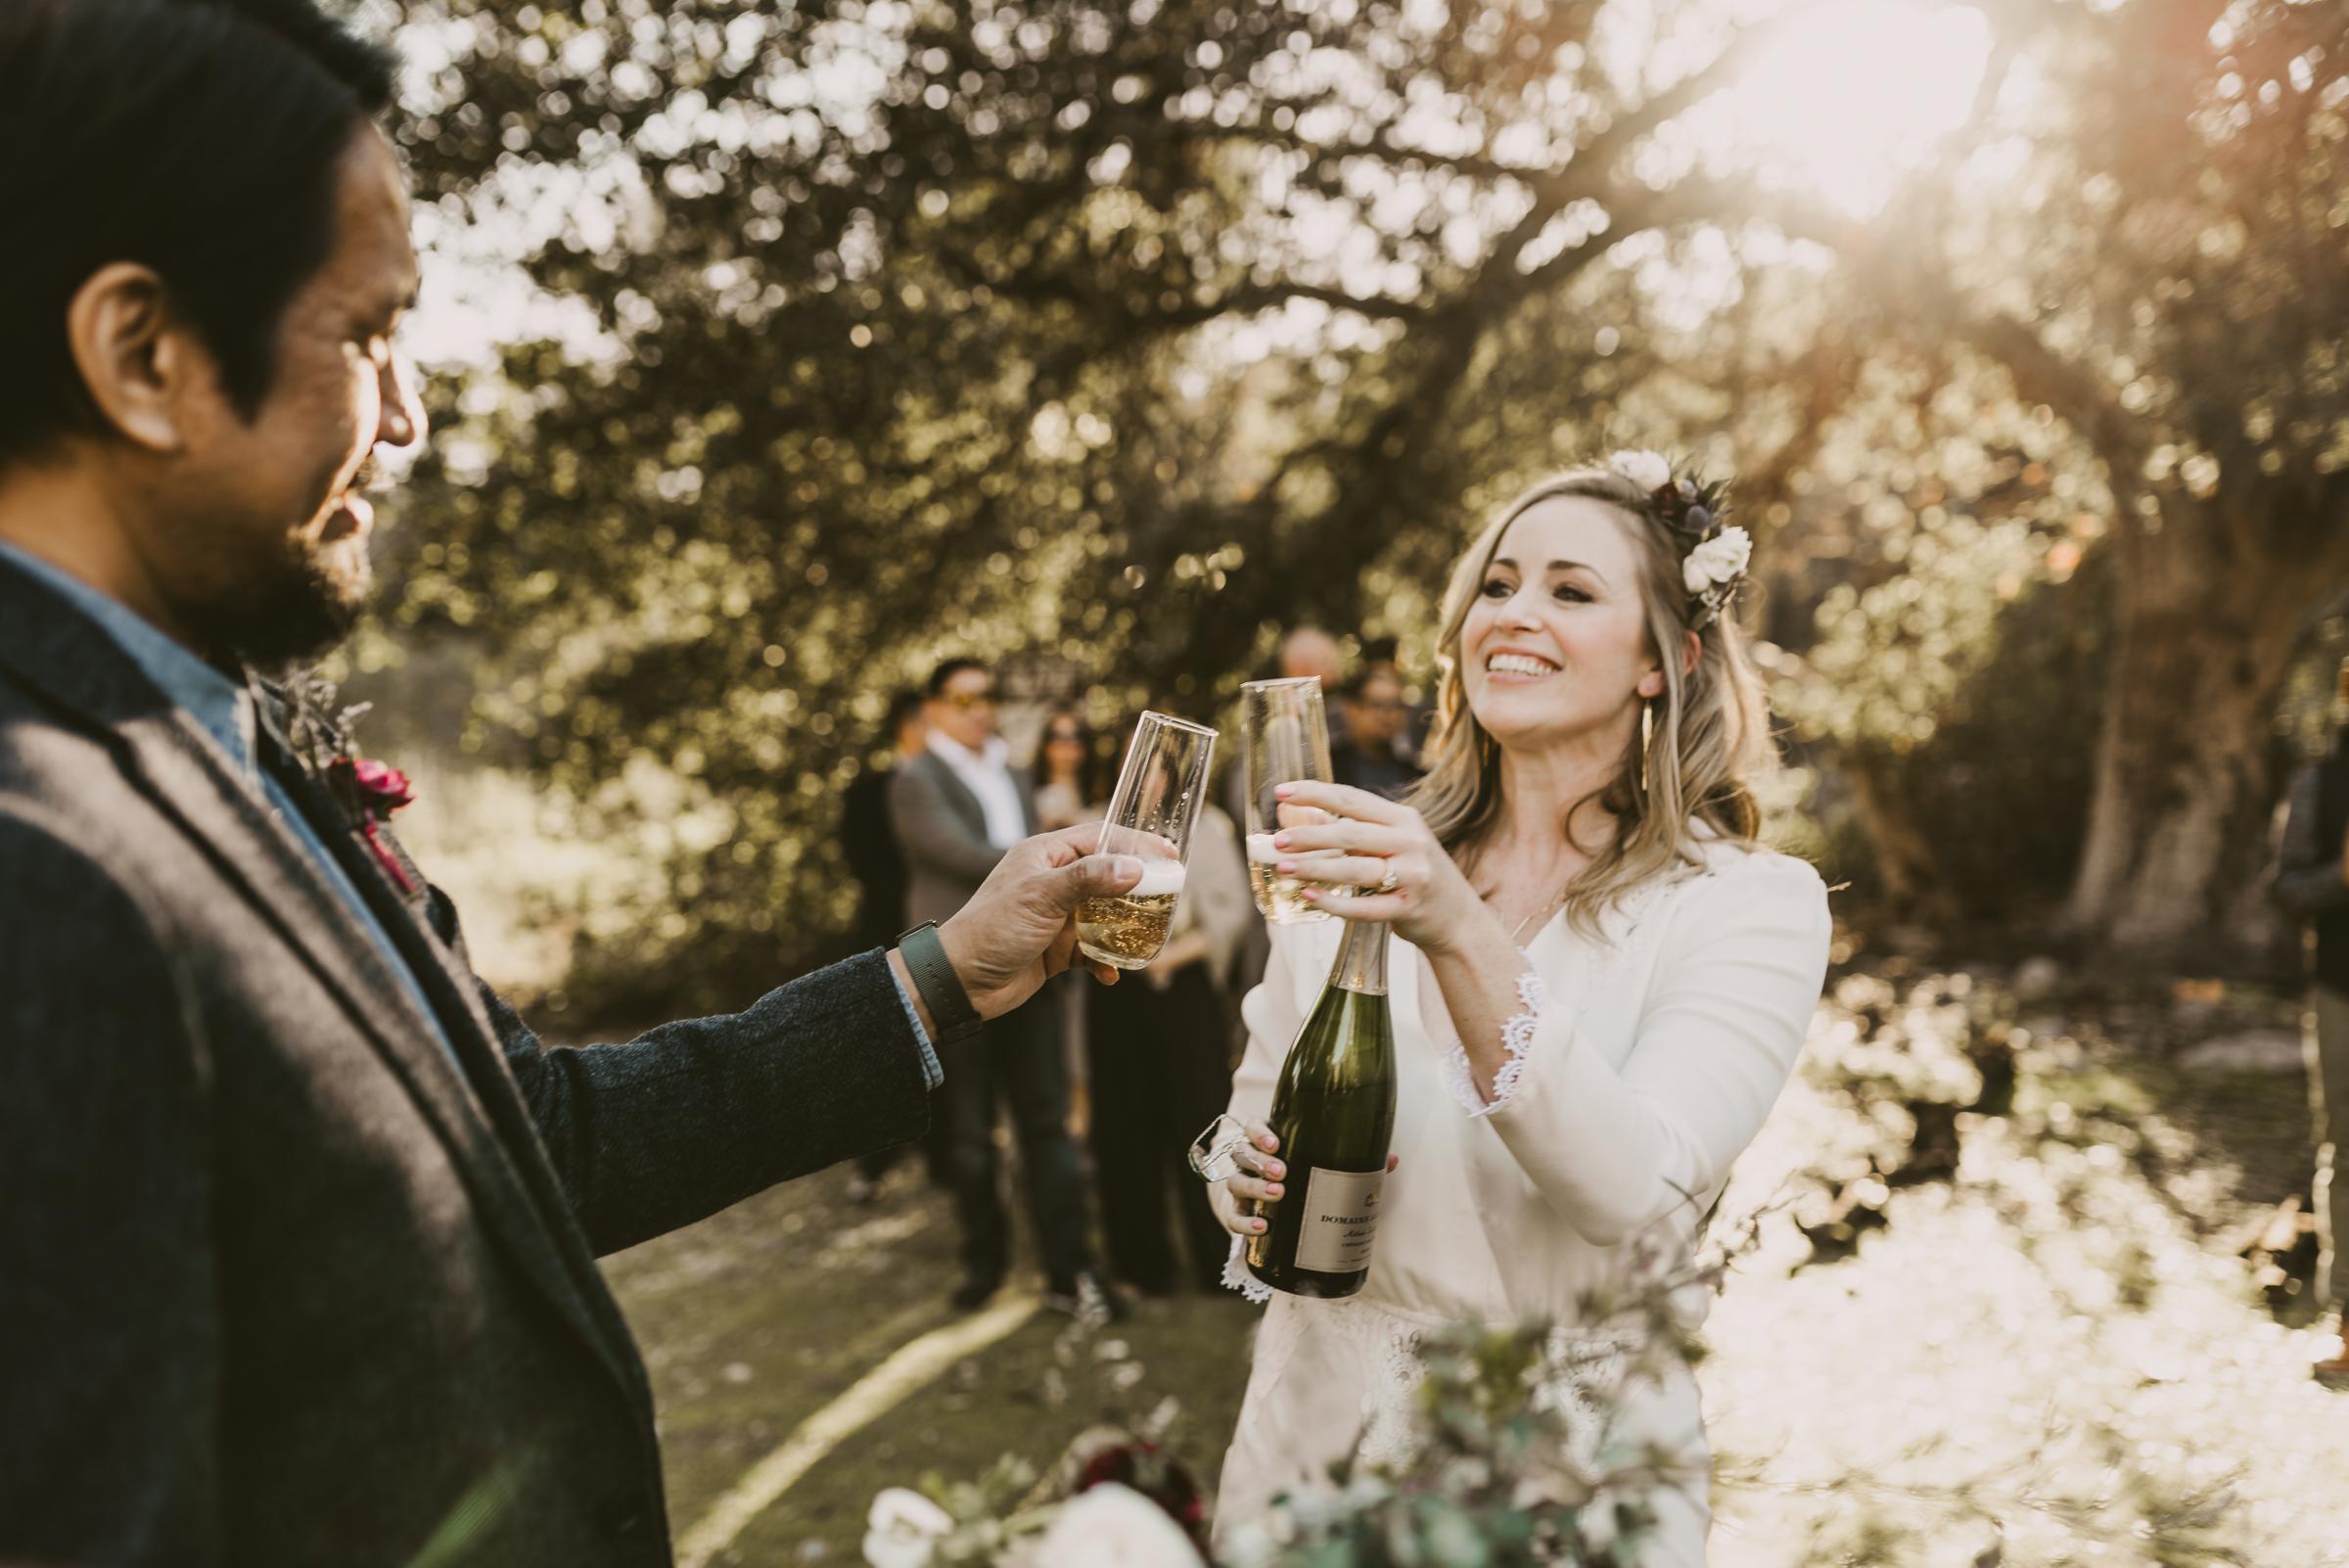 ©Isaiah + Taylor Photography - Intimate Elopement, Eaton Canyon, Los Angeles Wedding Photographer-44.jpg